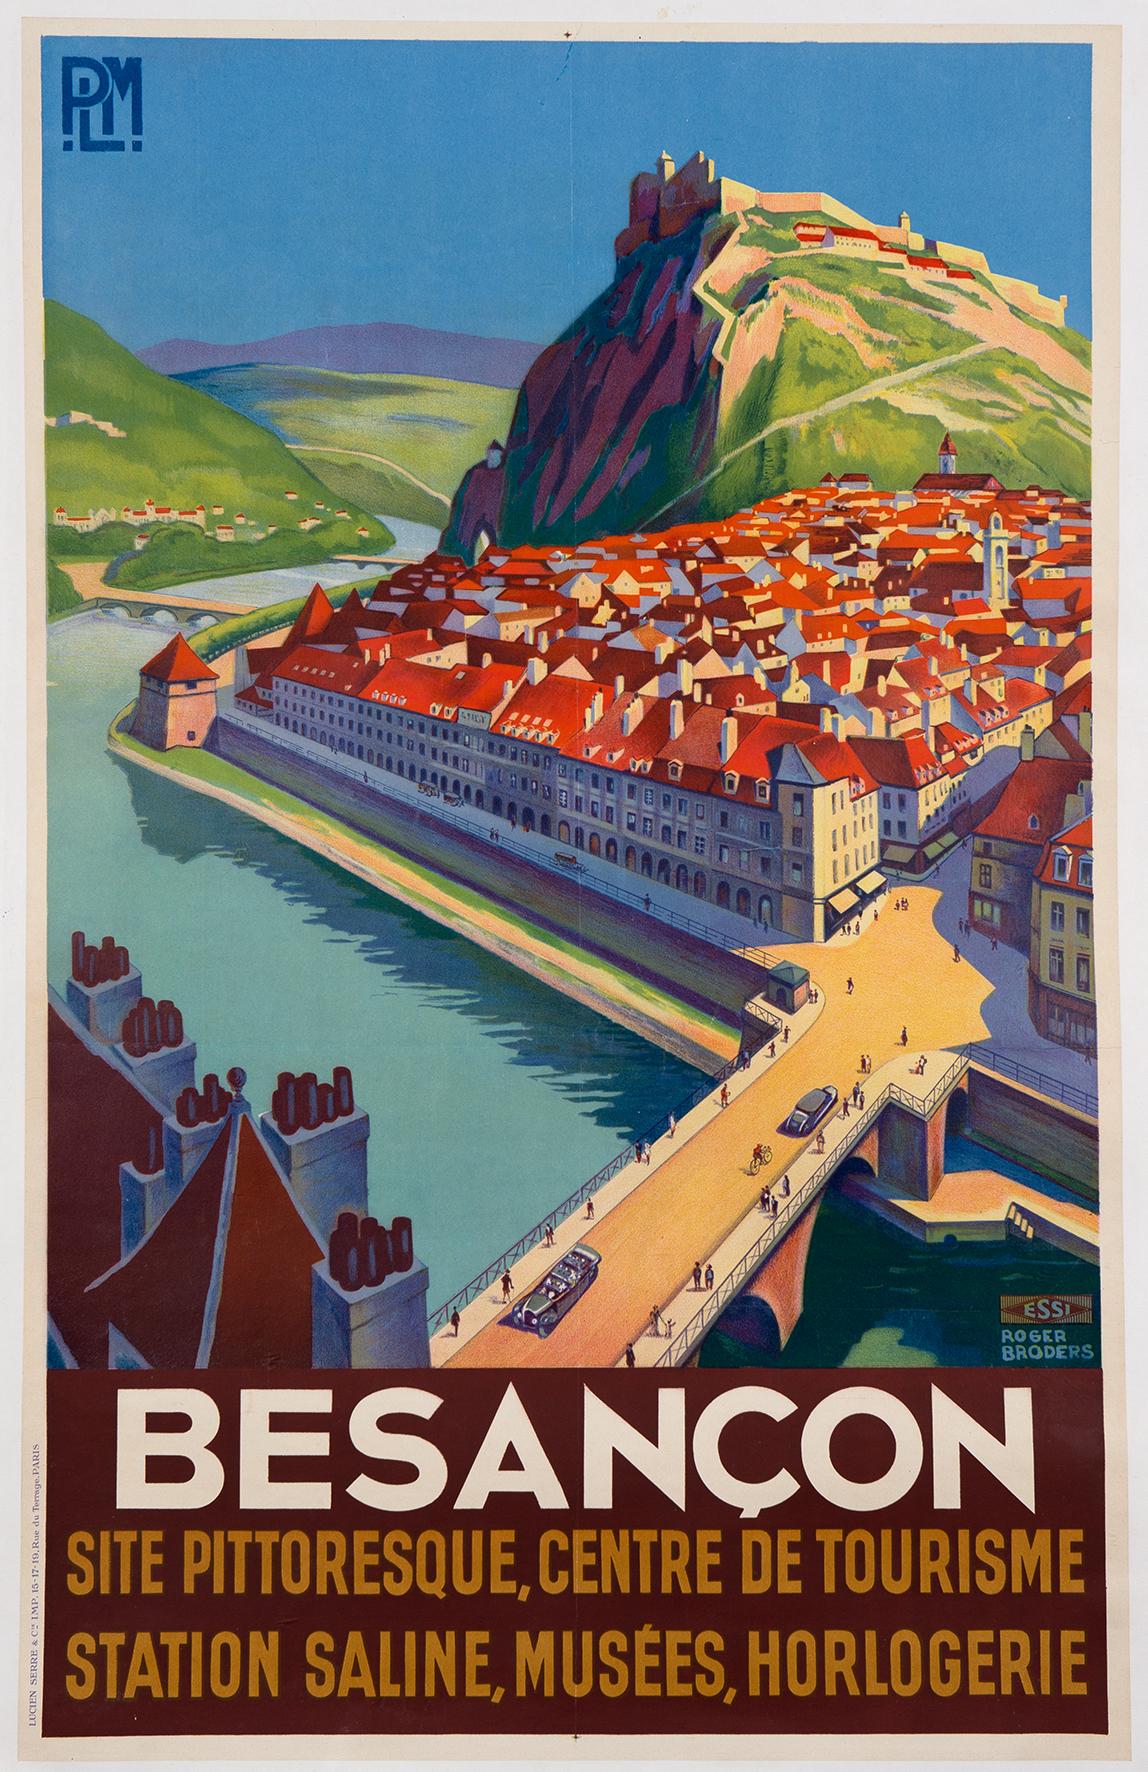 Roger Broders Besançon